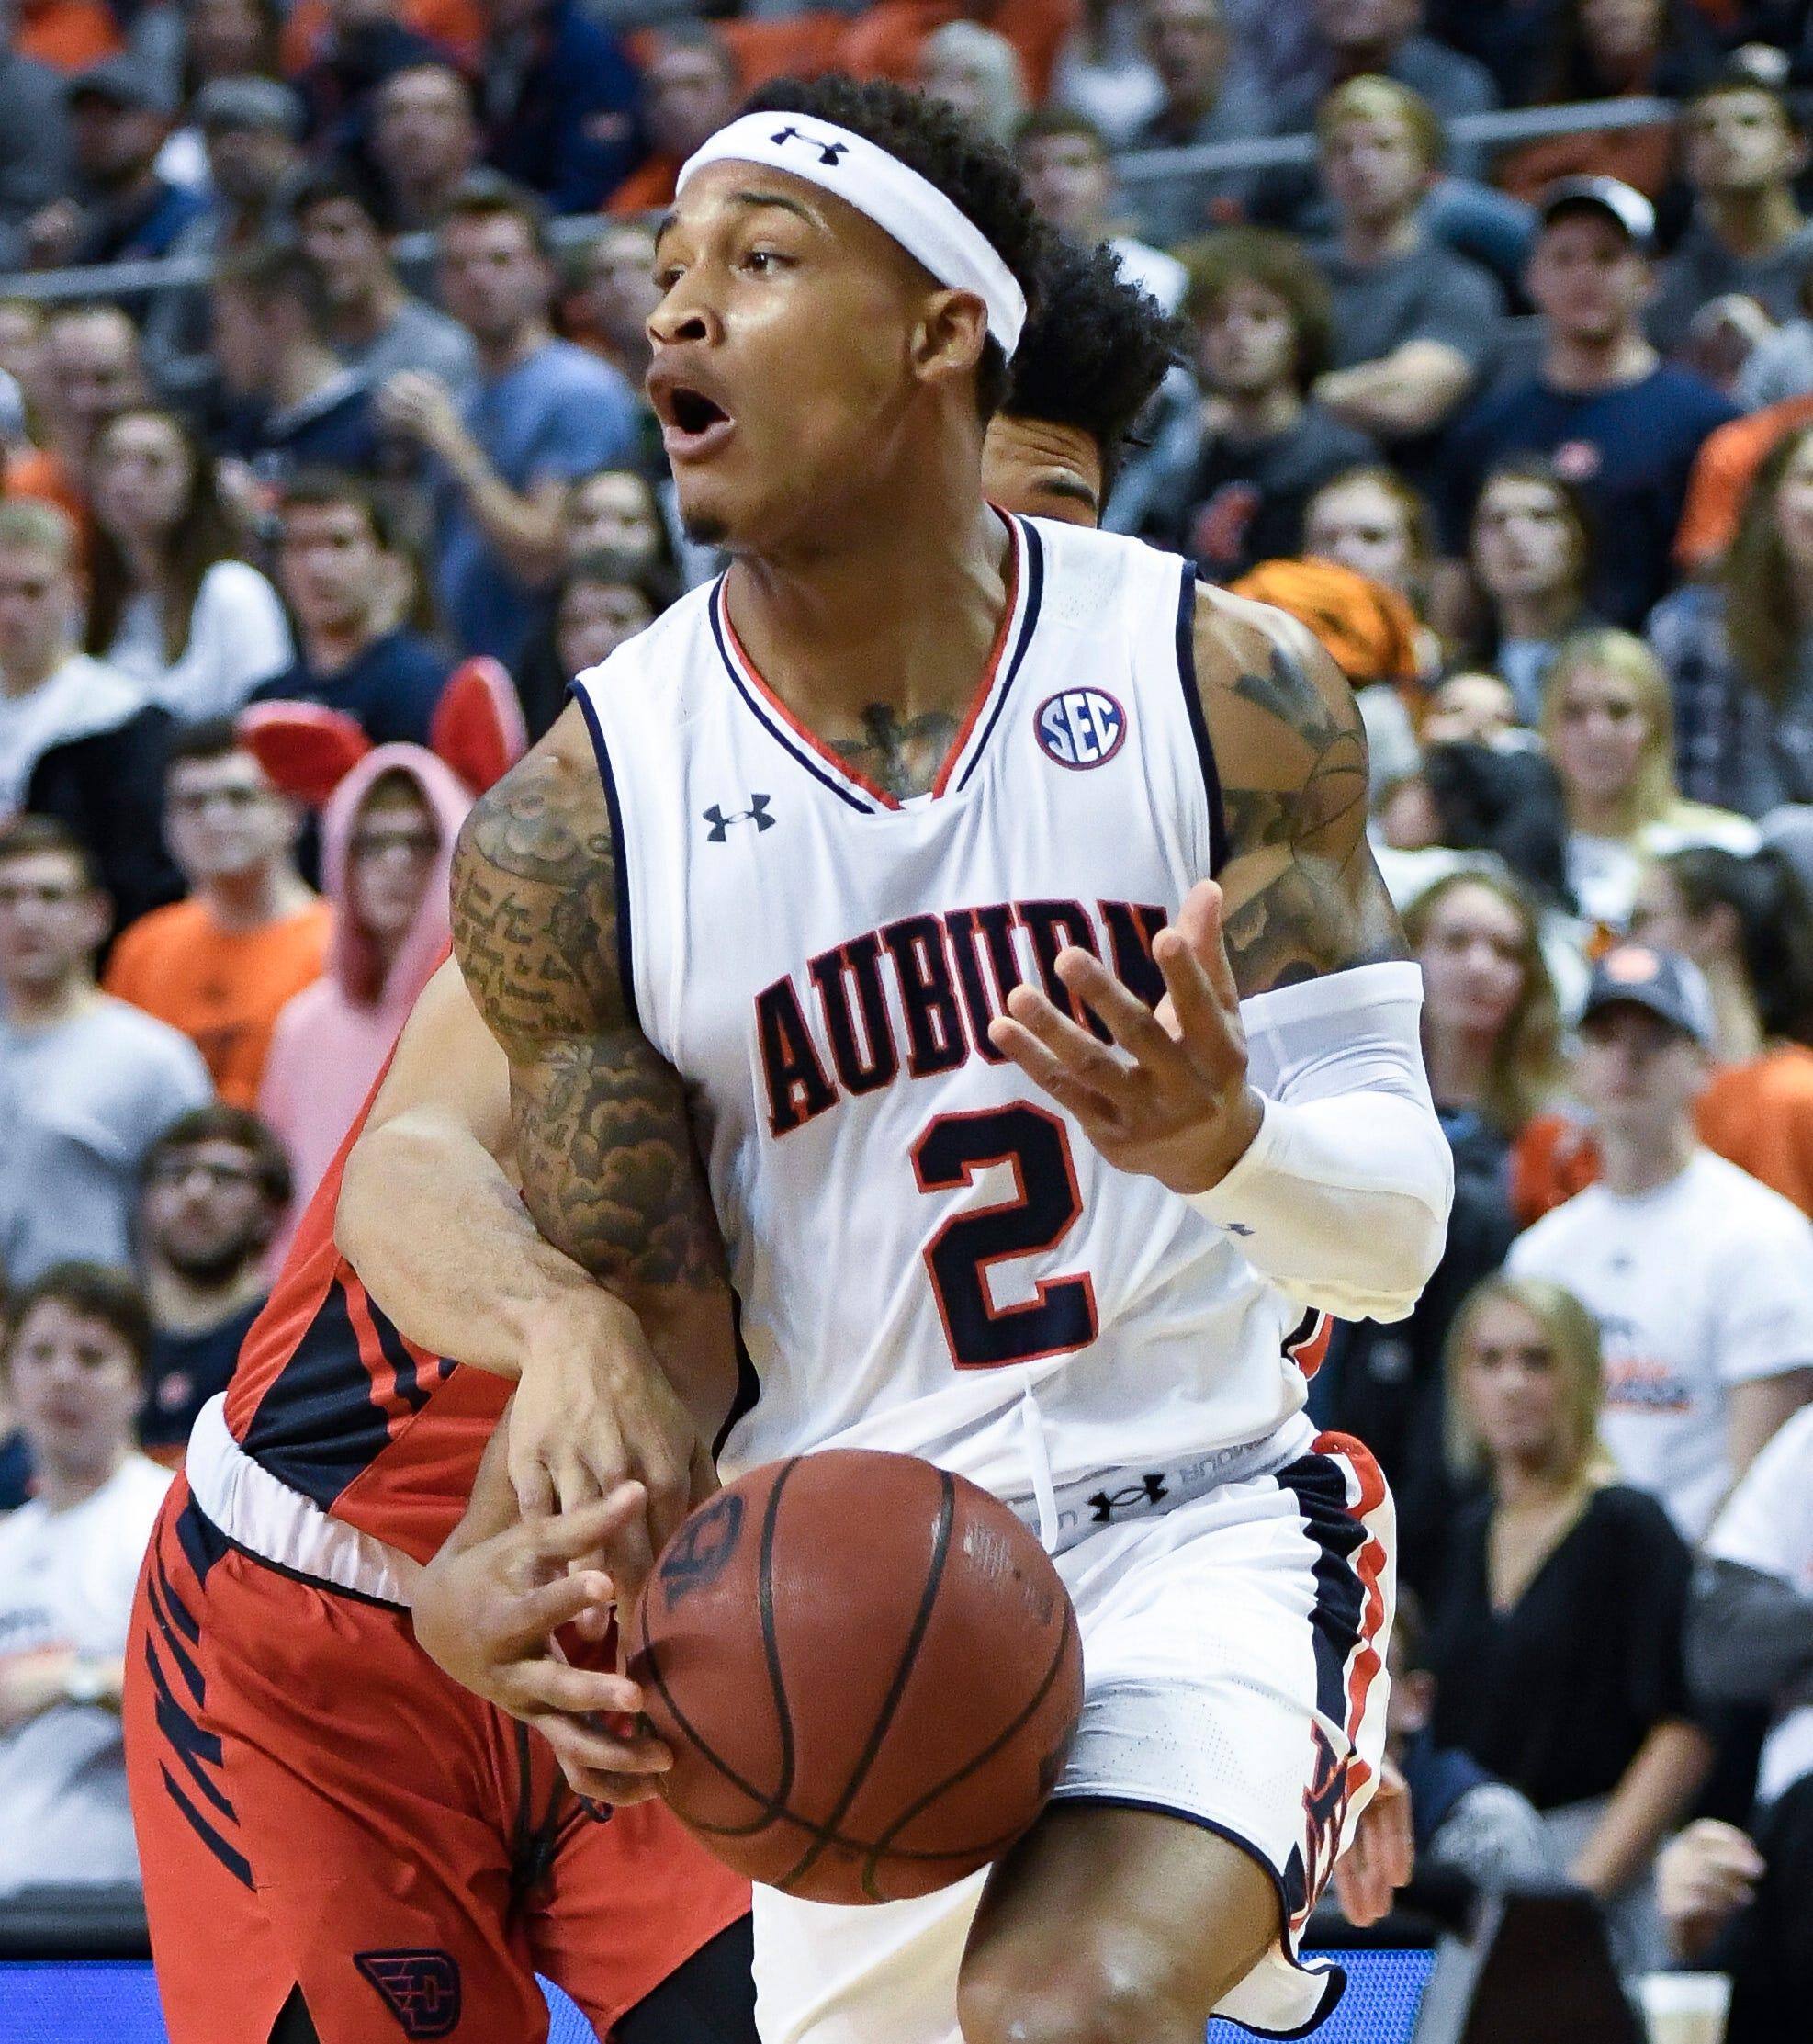 Brown's 34 points leads No. 8 Auburn past Dayton 82-72